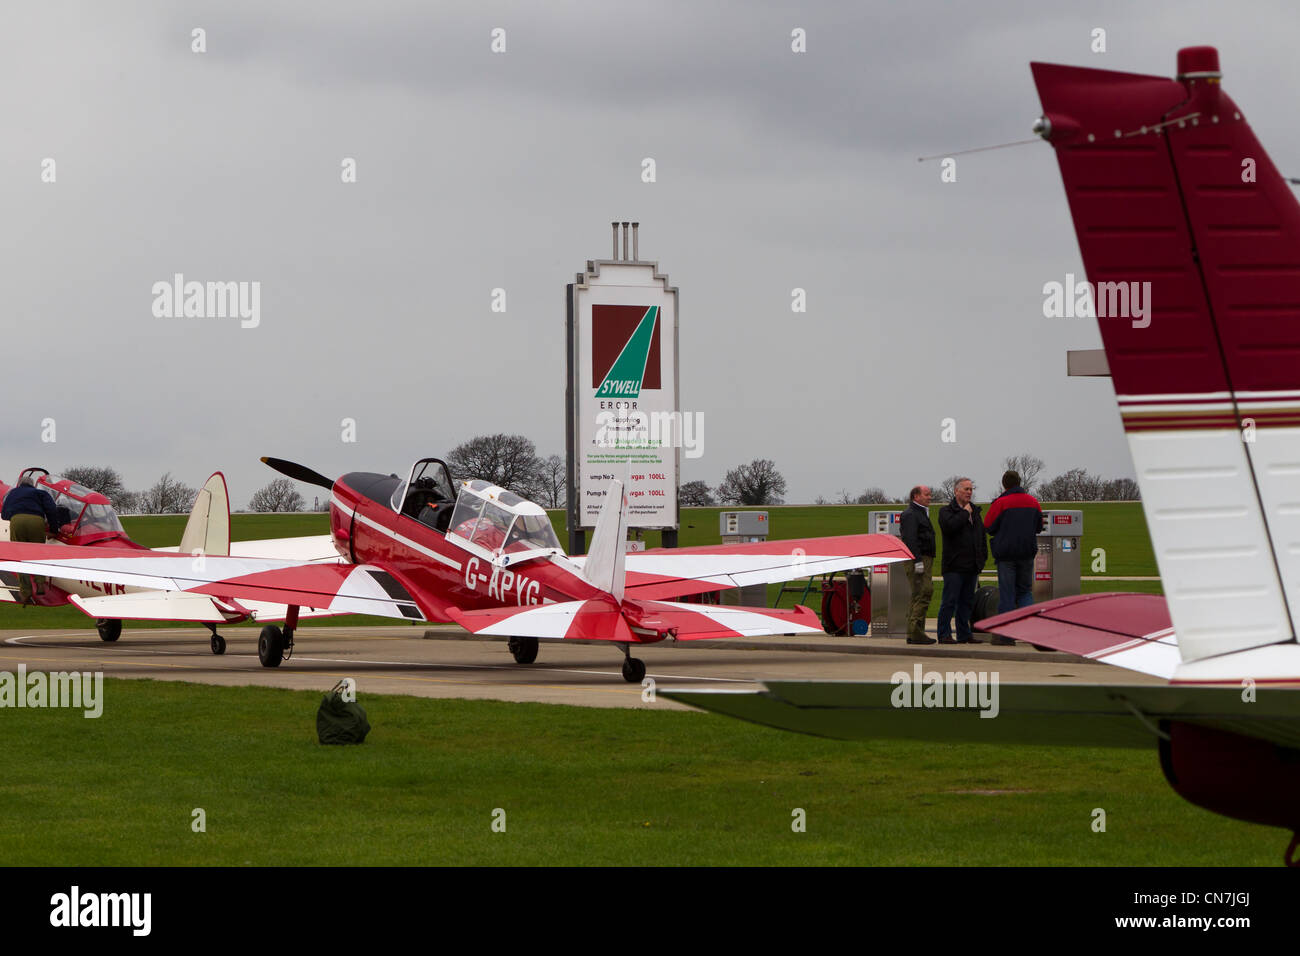 Light aircraft at fuel pumps Sywell Aerodrome Northamptonshire - Stock Image